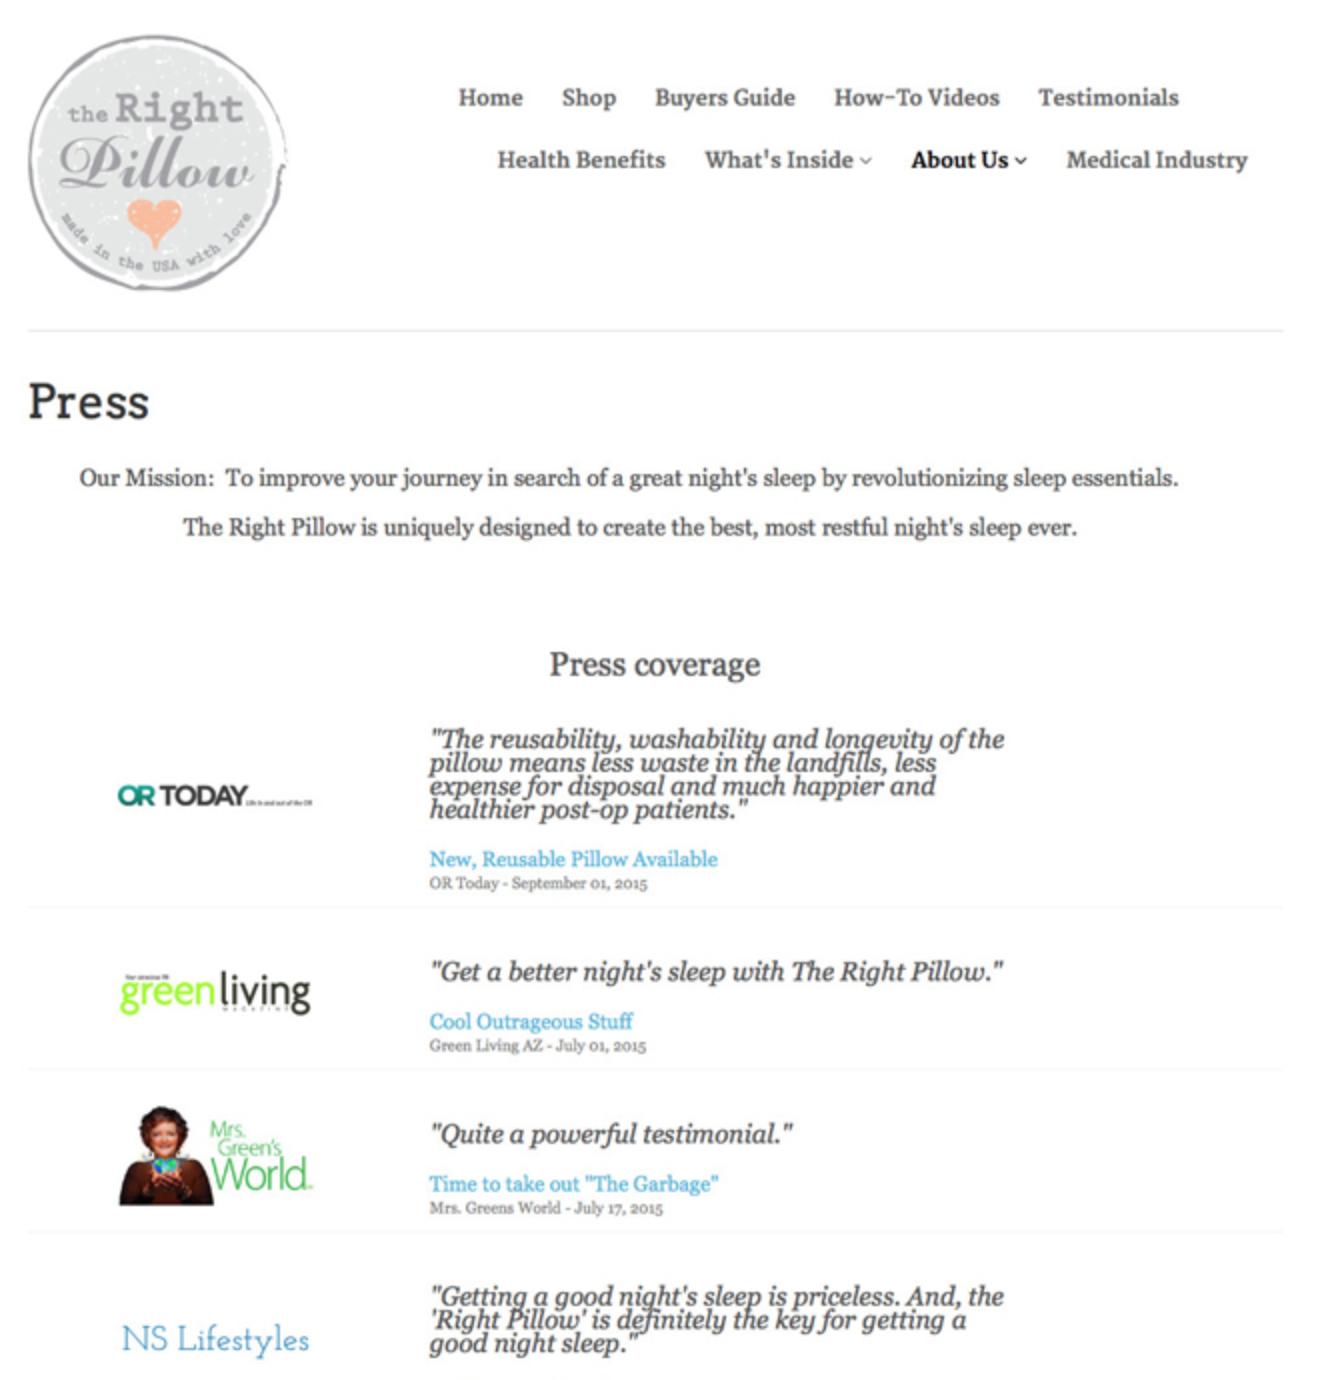 Screenshot showing a press page